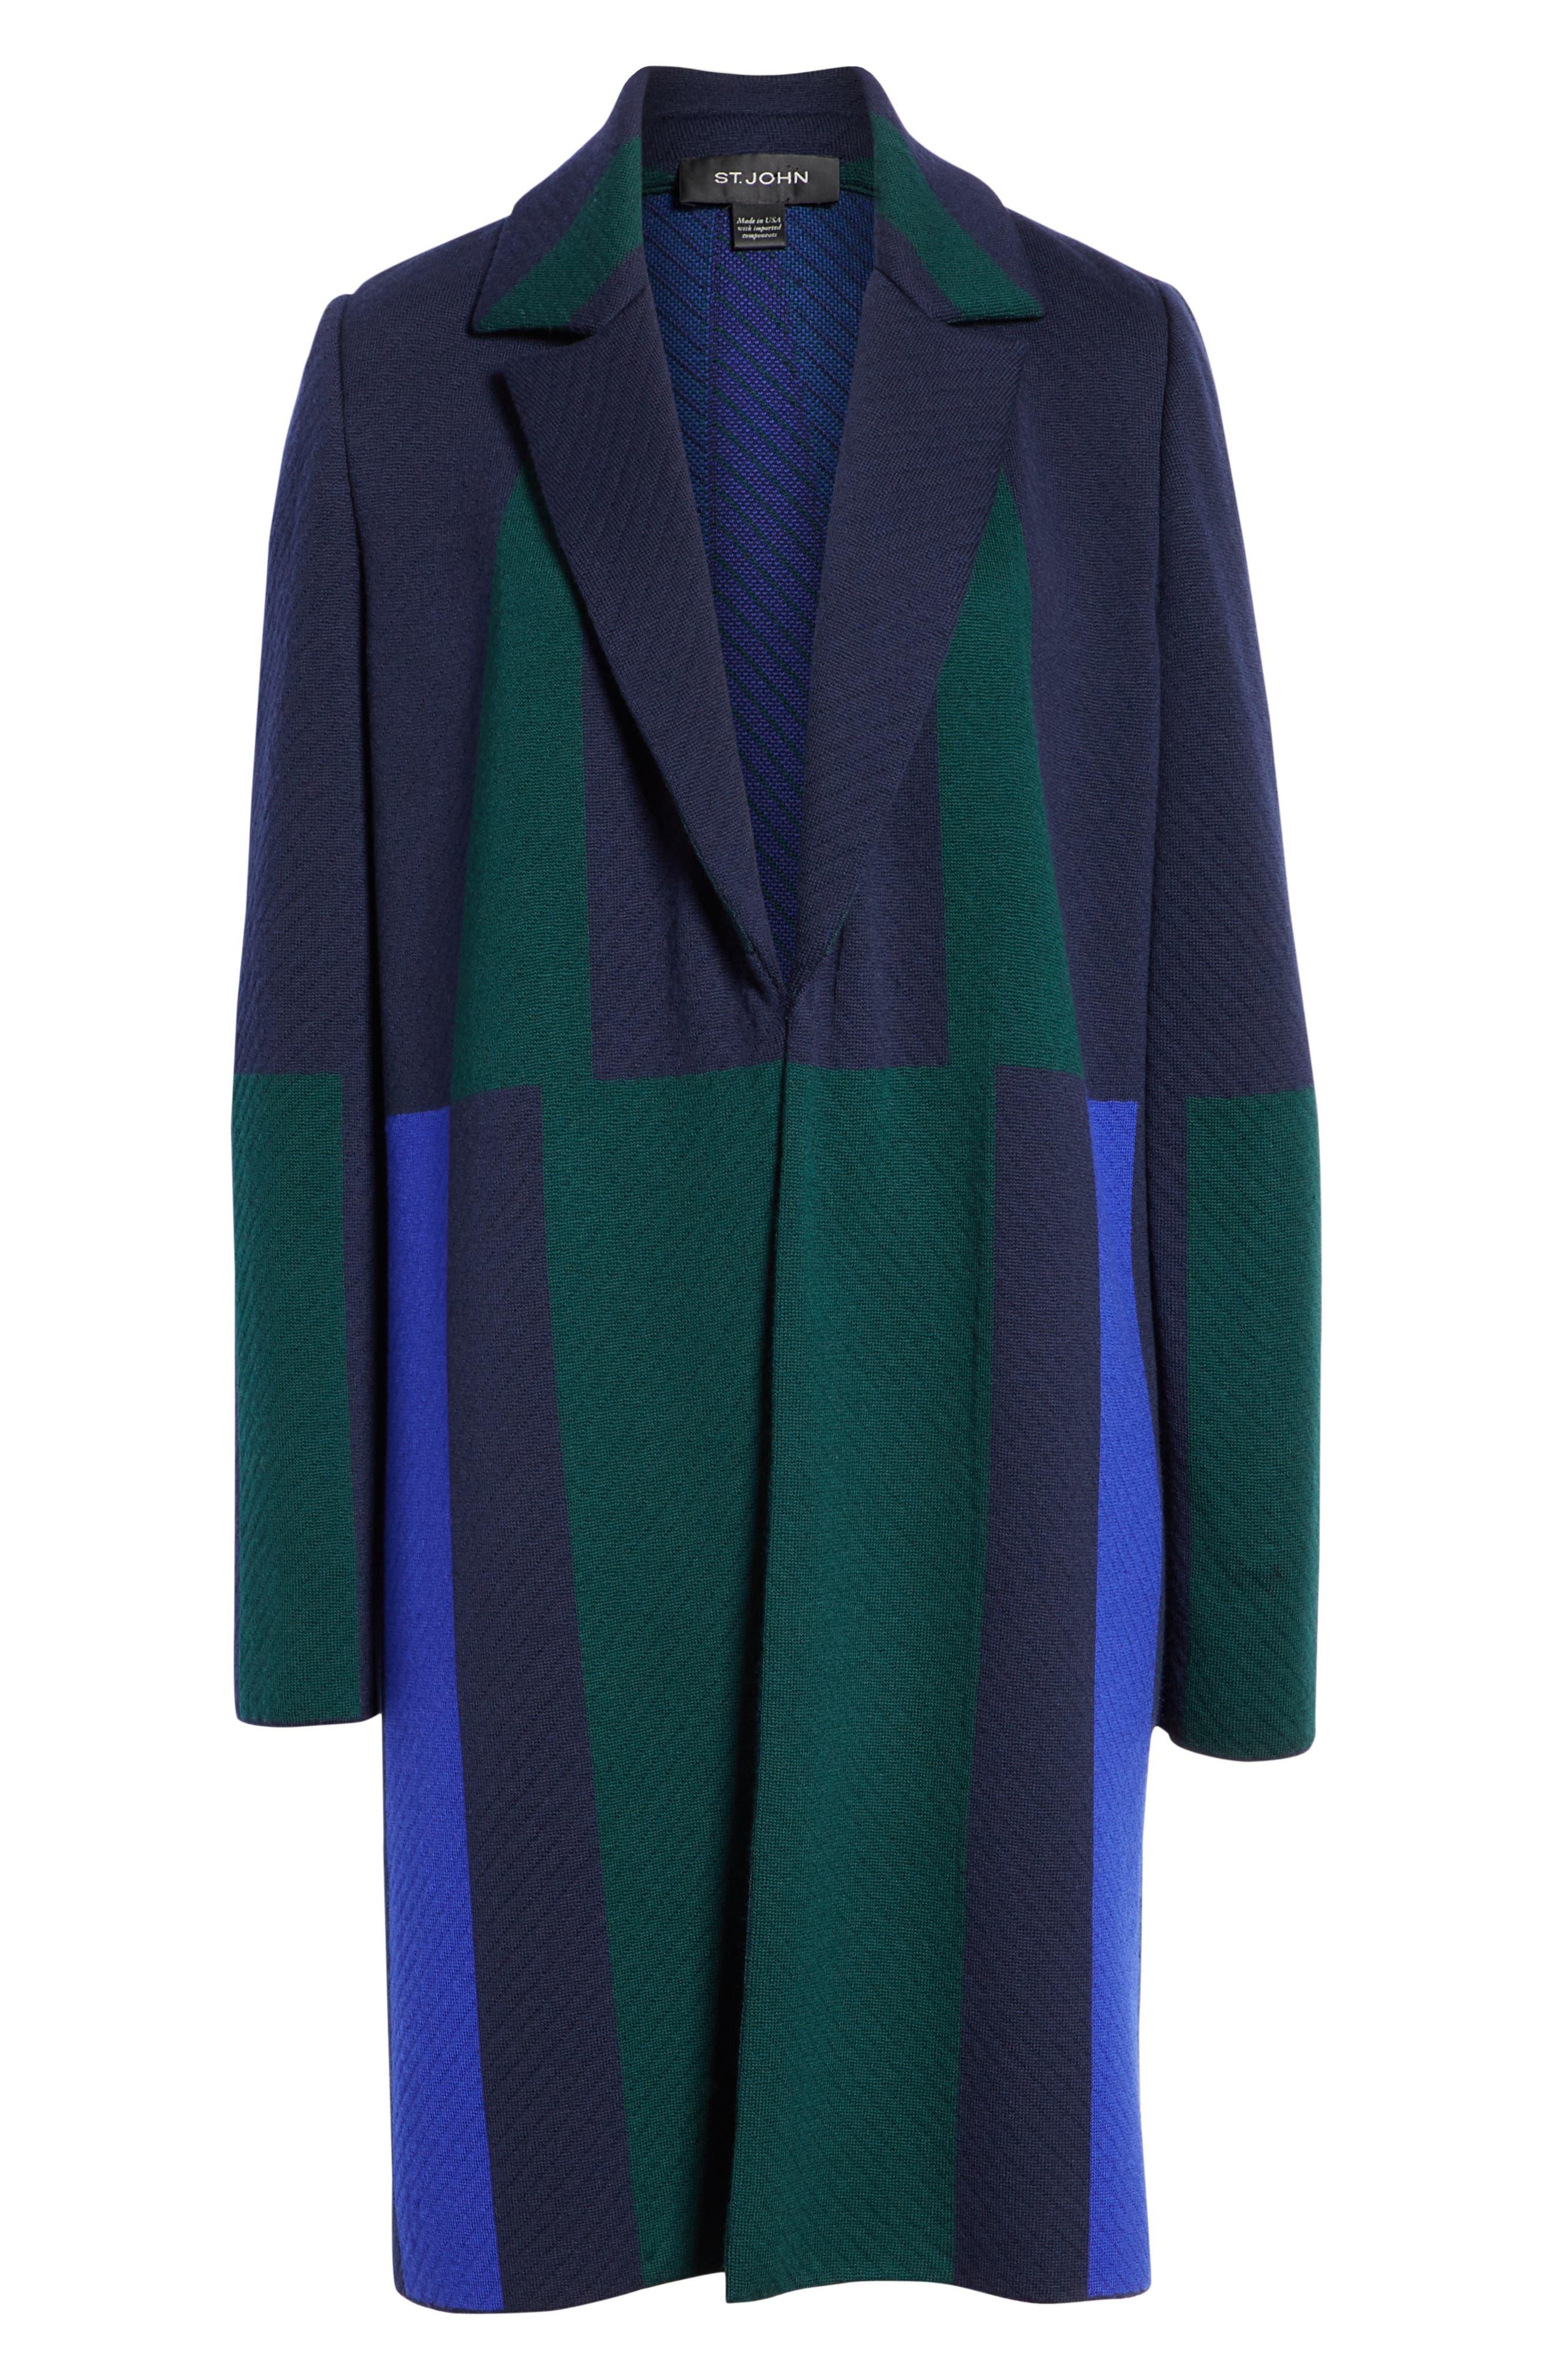 Colorblock Intarsia Wool Twill Jacket,                             Alternate thumbnail 6, color,                             NAVY MULTI